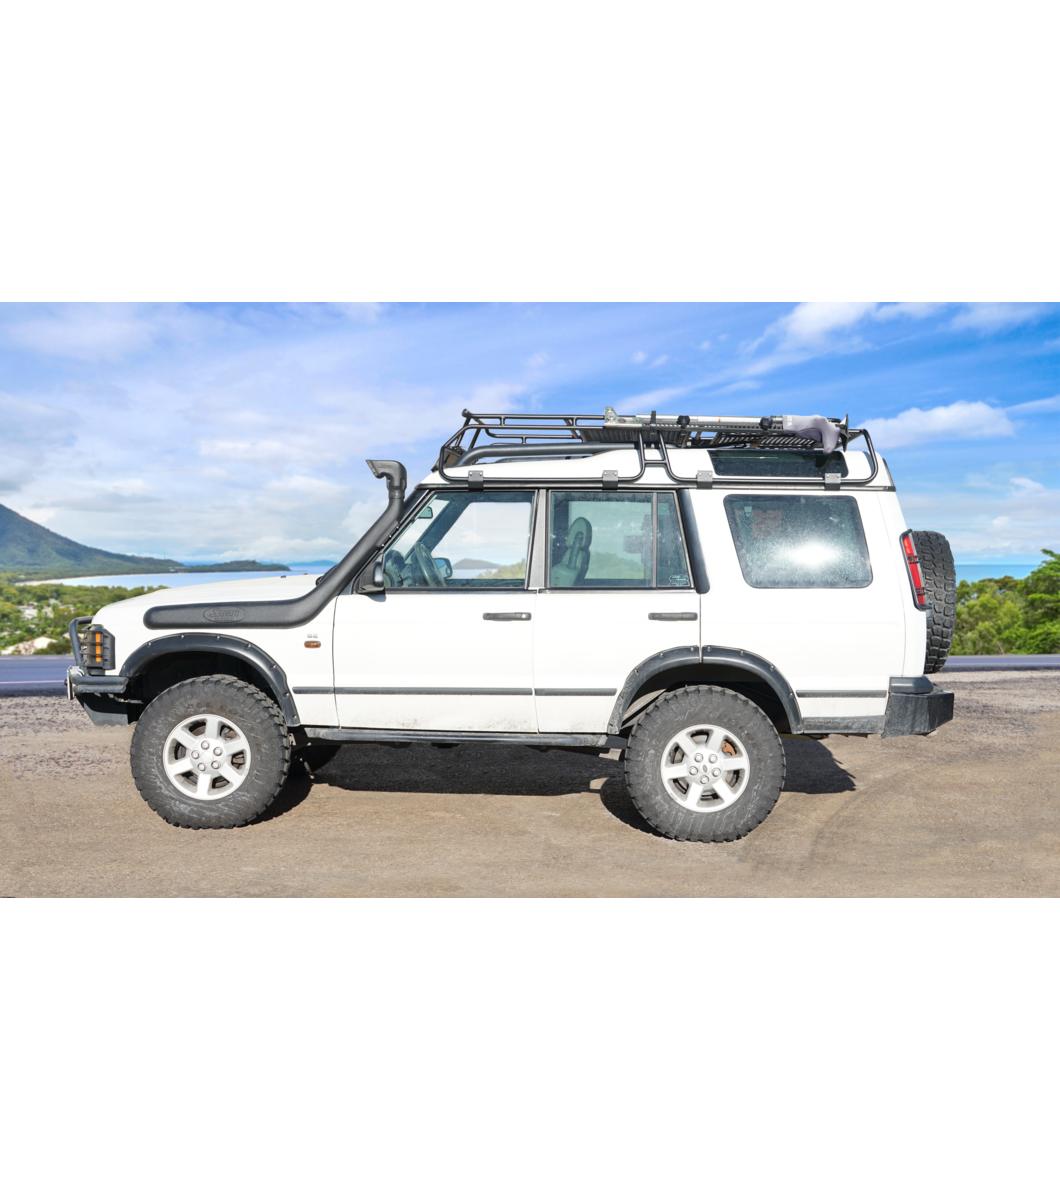 Land Rover Discovery 1995 Full Width: LAND ROVER DISCOVERY · RANGER RACK · Multi-Light Setup